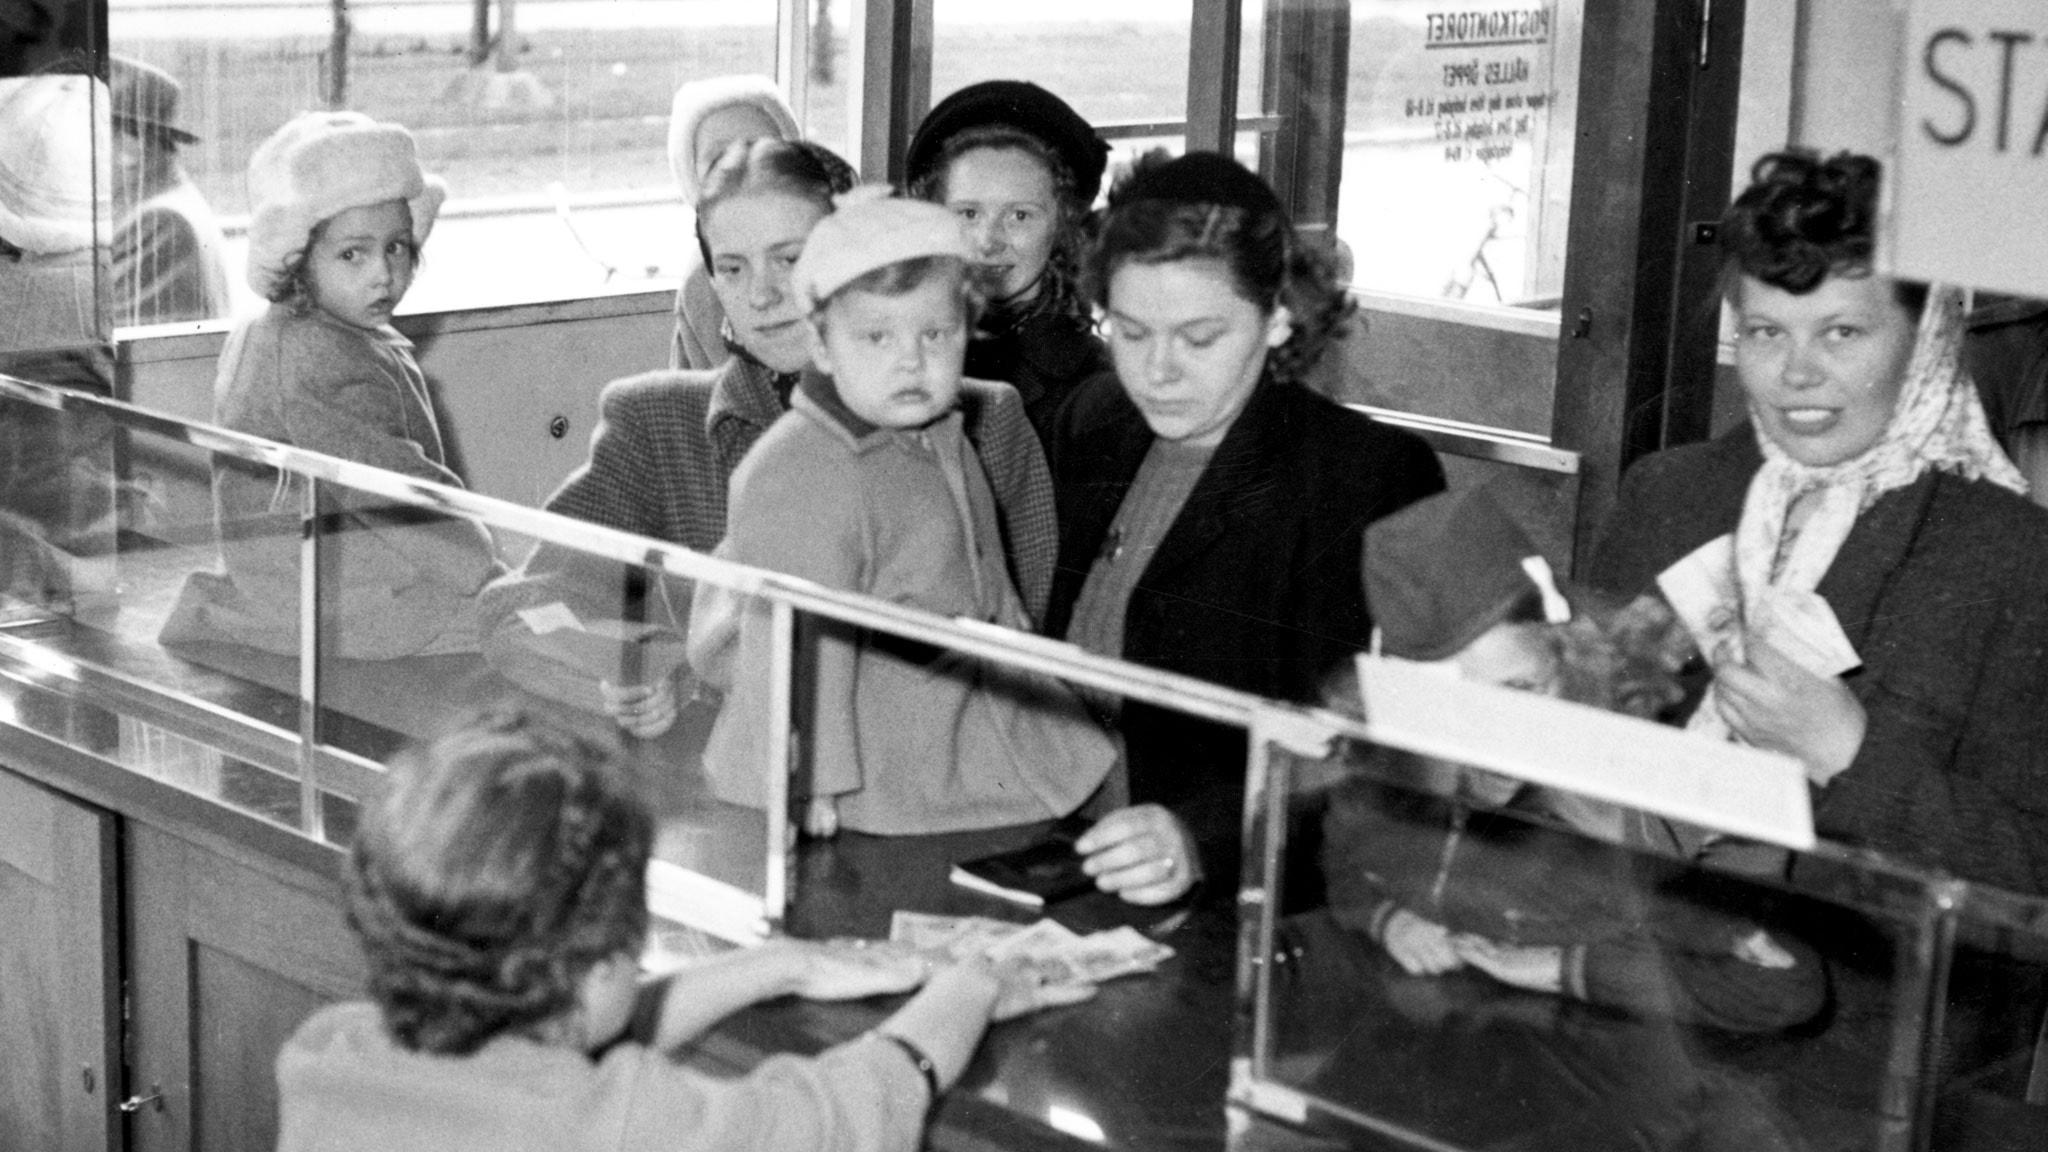 Fru Persson gläds åt barnbidraget 1948